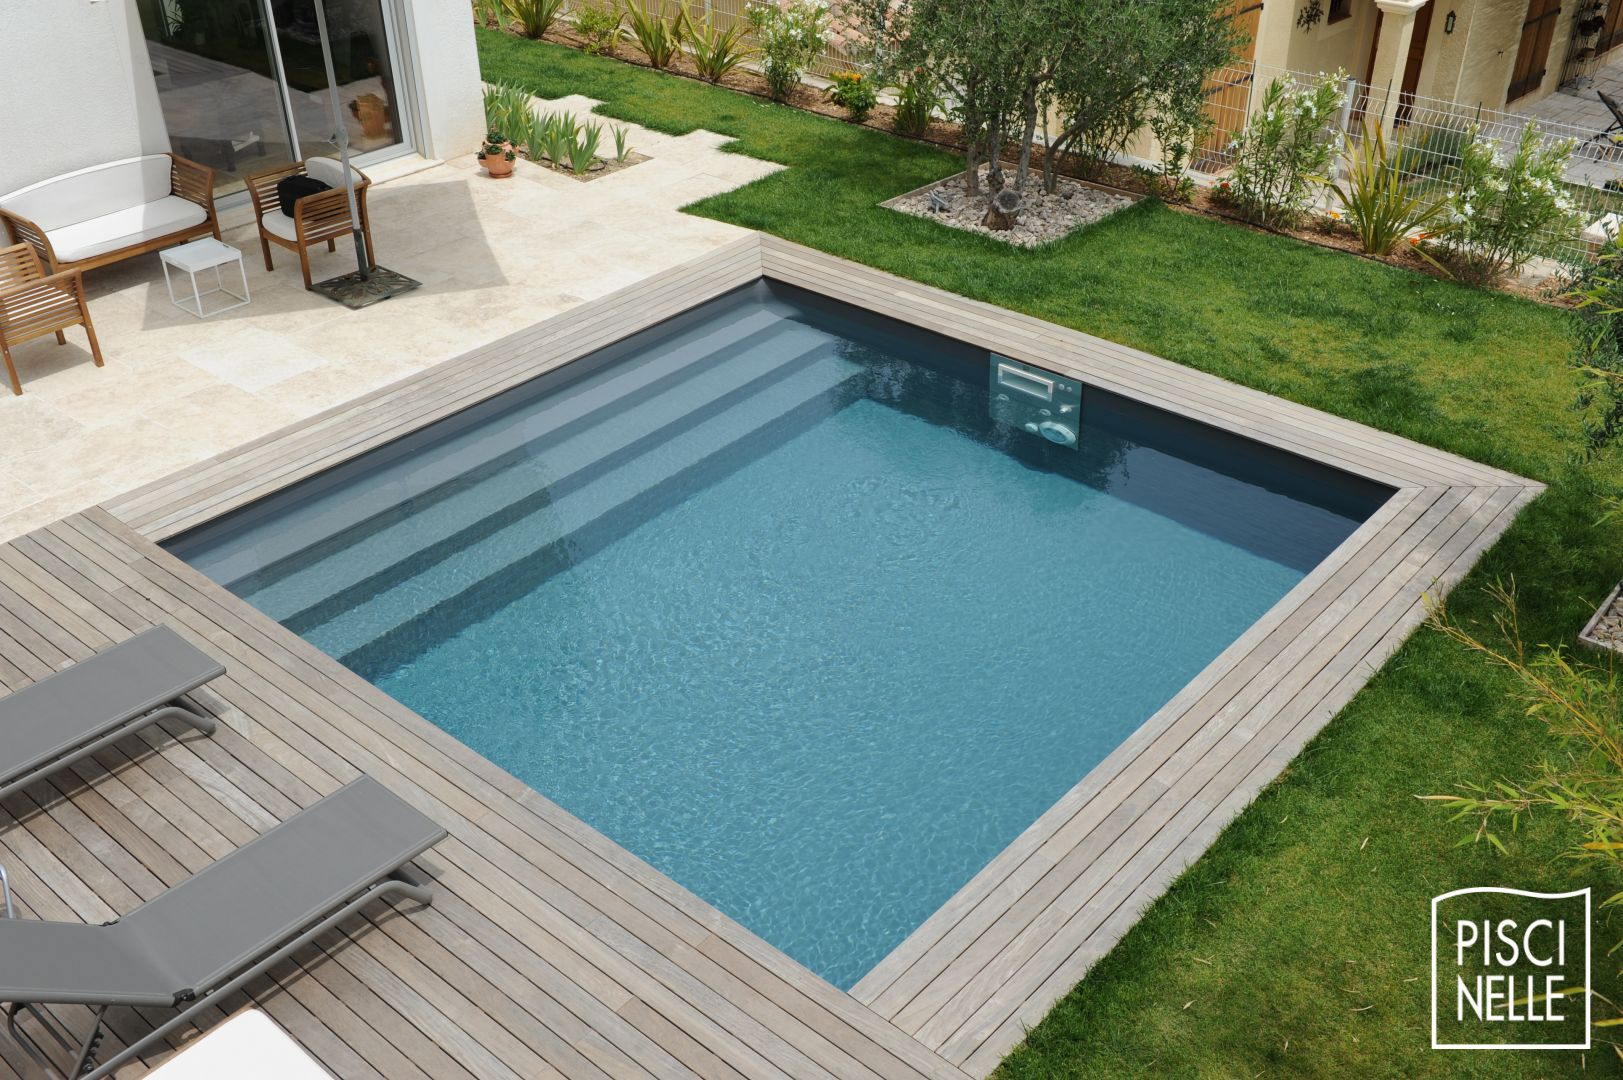 Diaporama de photos de piscines design et contemporaines